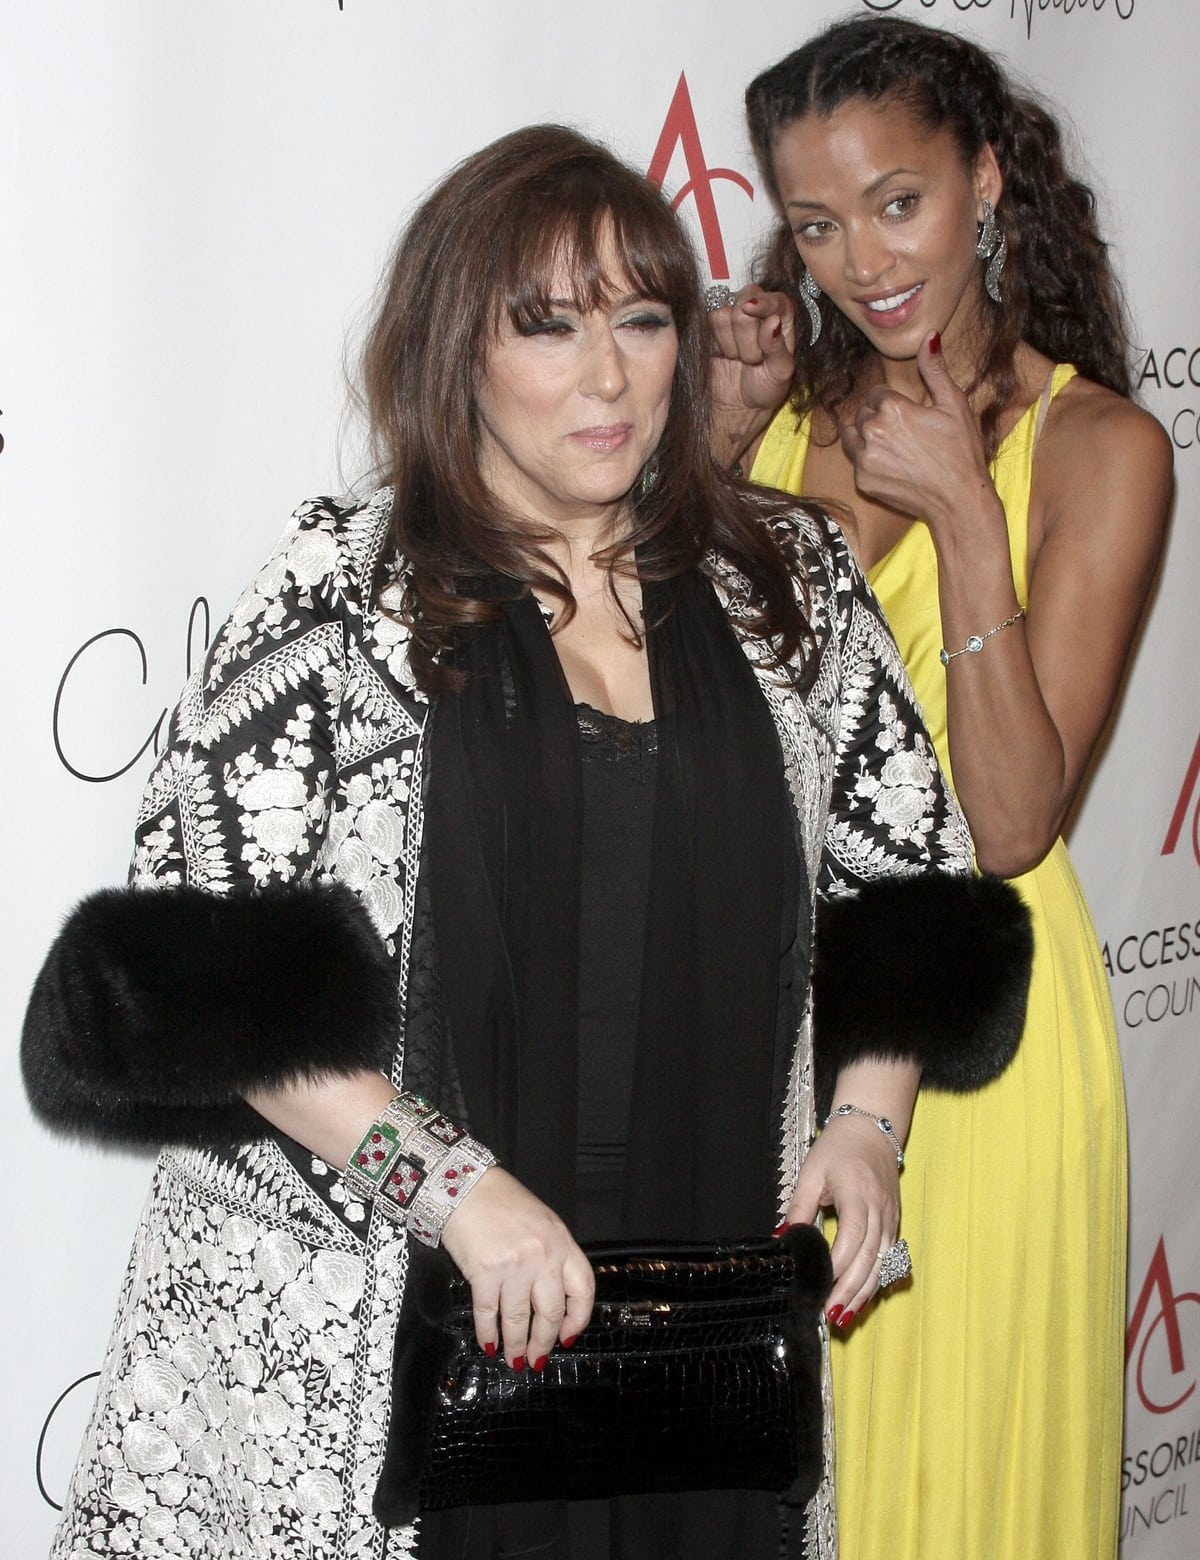 American bespoke high jewelry designer Lorraine Schwartz (L) and French model Noémie Lenoir